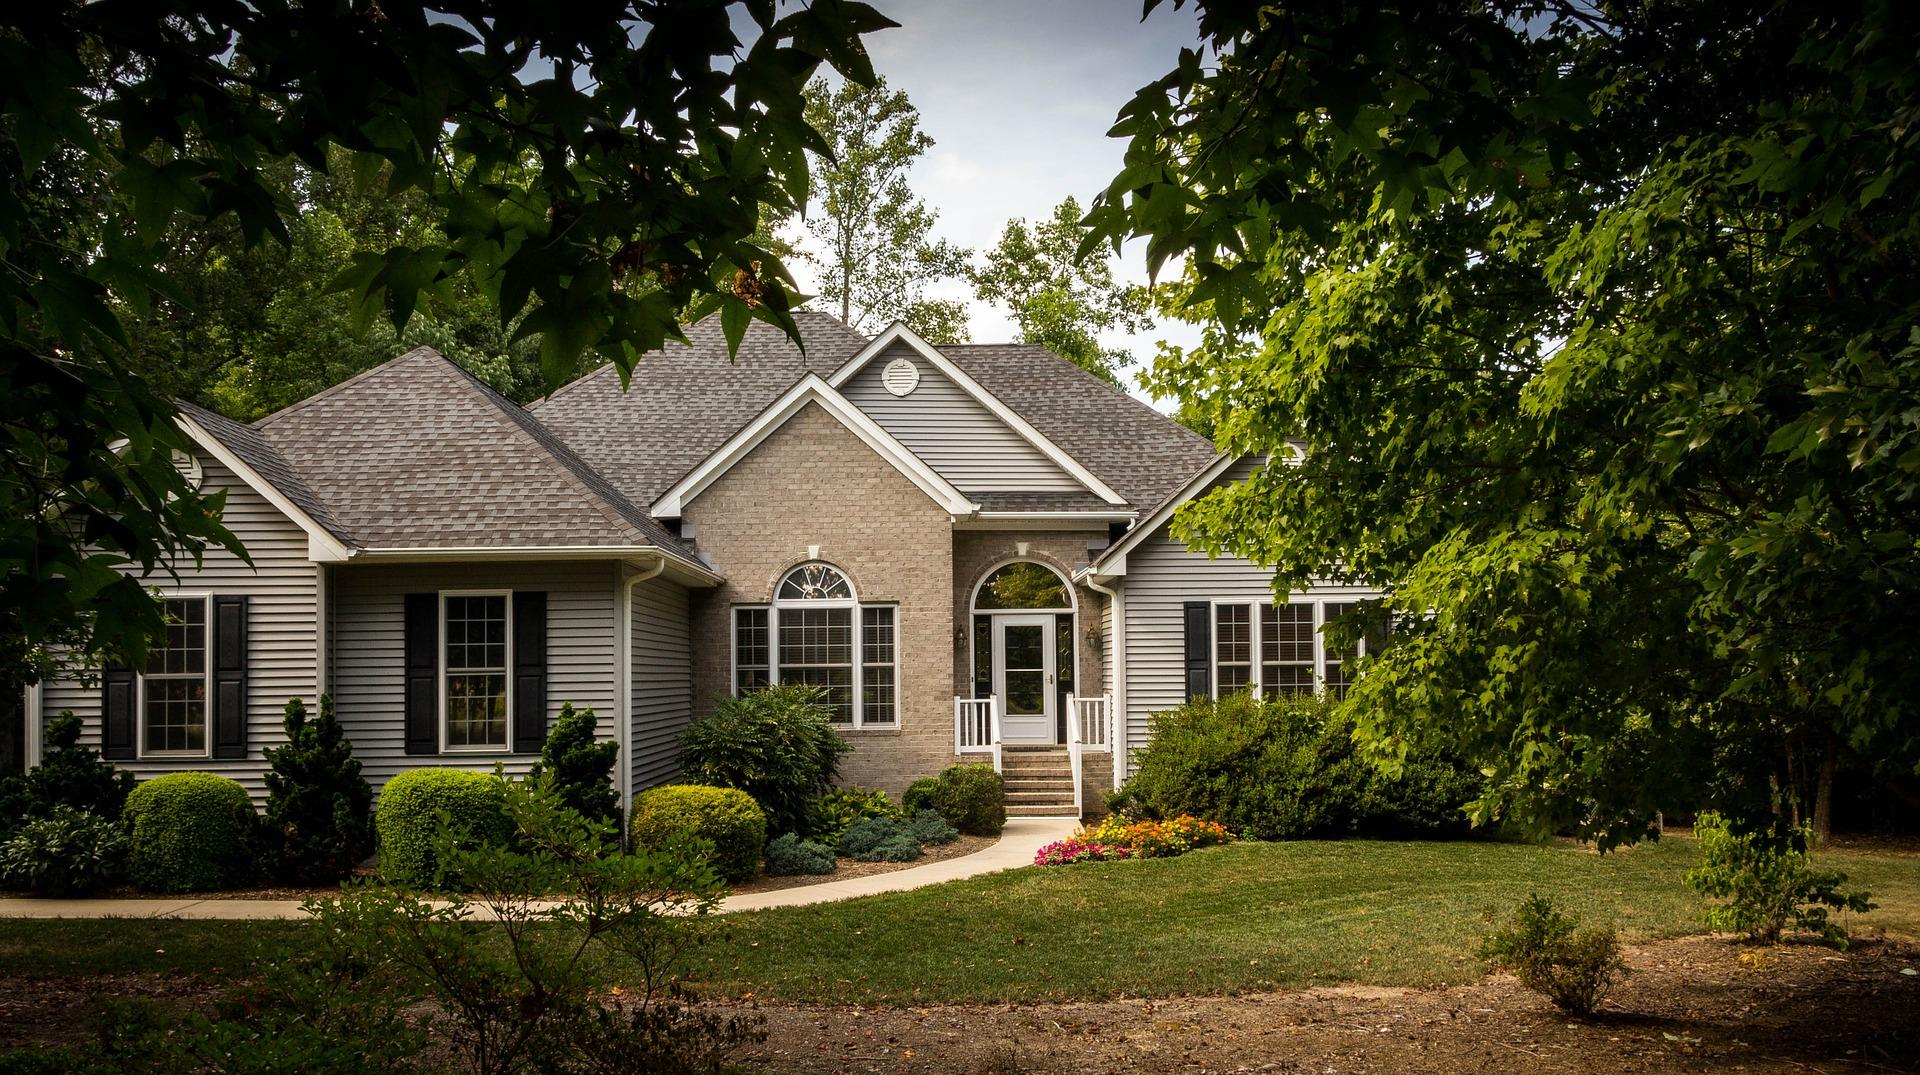 house-409451_1920 (1)